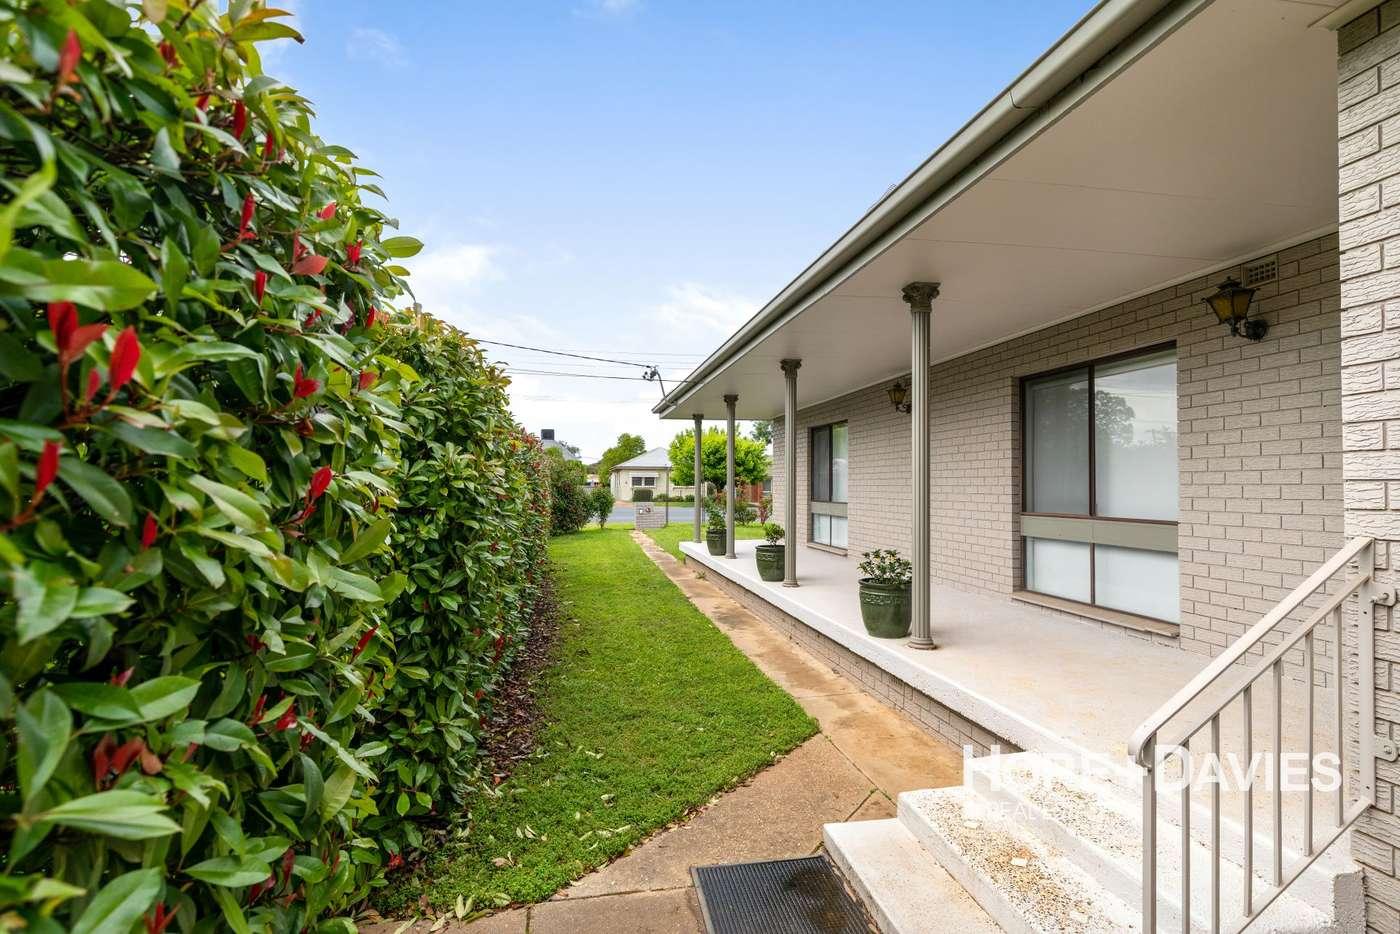 Main view of Homely house listing, 257 Kincaid Street, Wagga Wagga NSW 2650